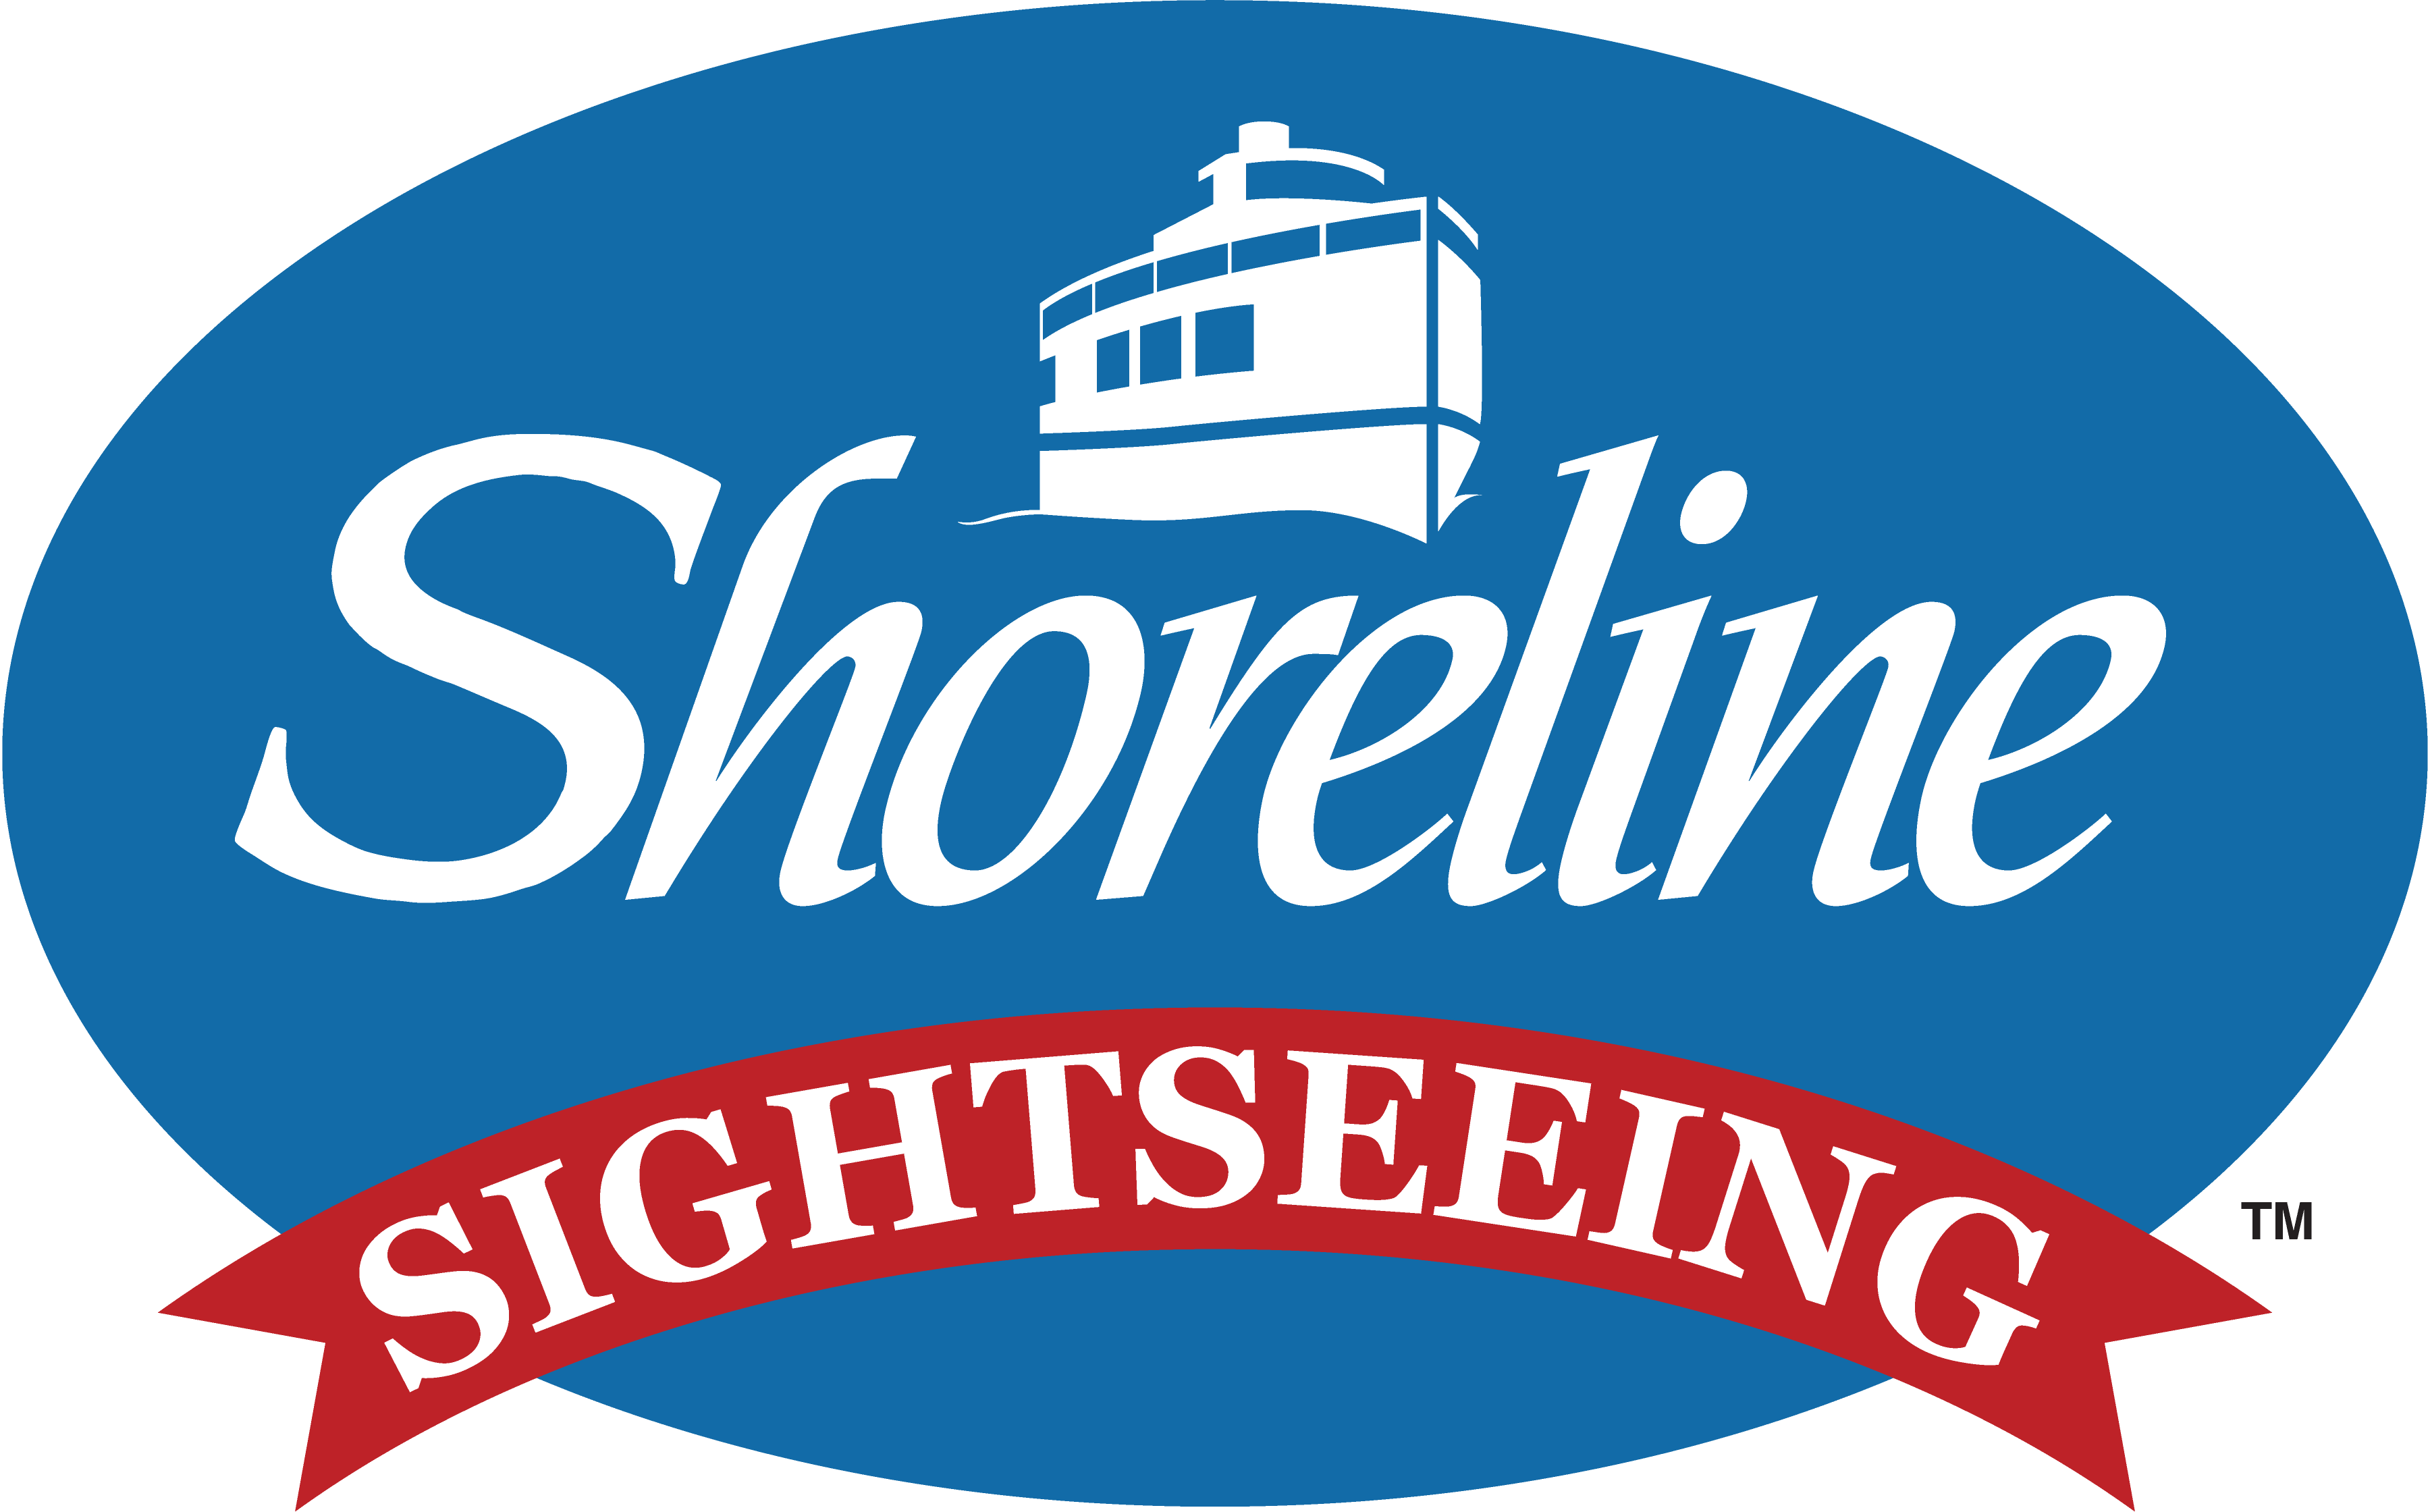 Shoreline Sightseeing  Logo